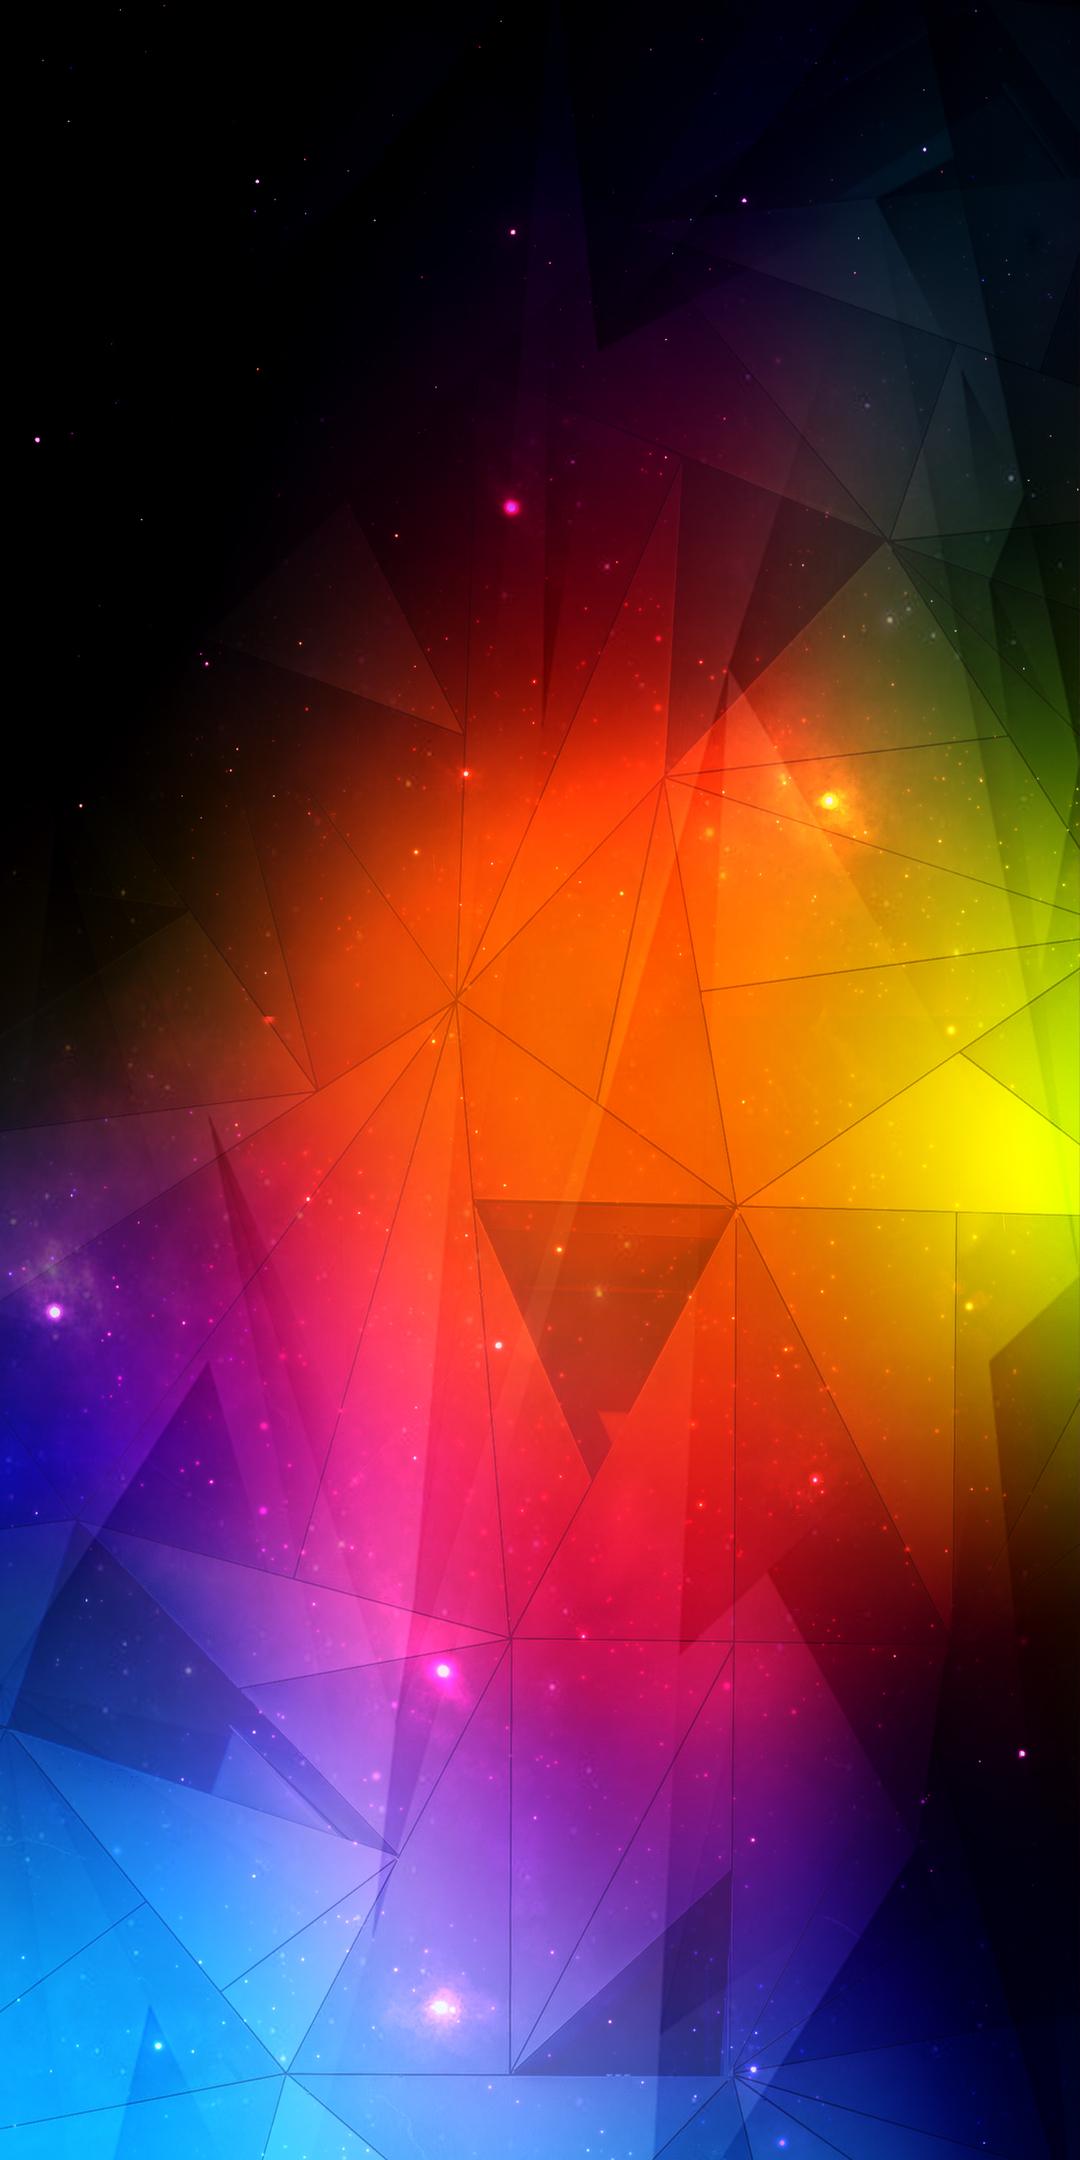 triangle-abstract-mesh-4k-k7.jpg